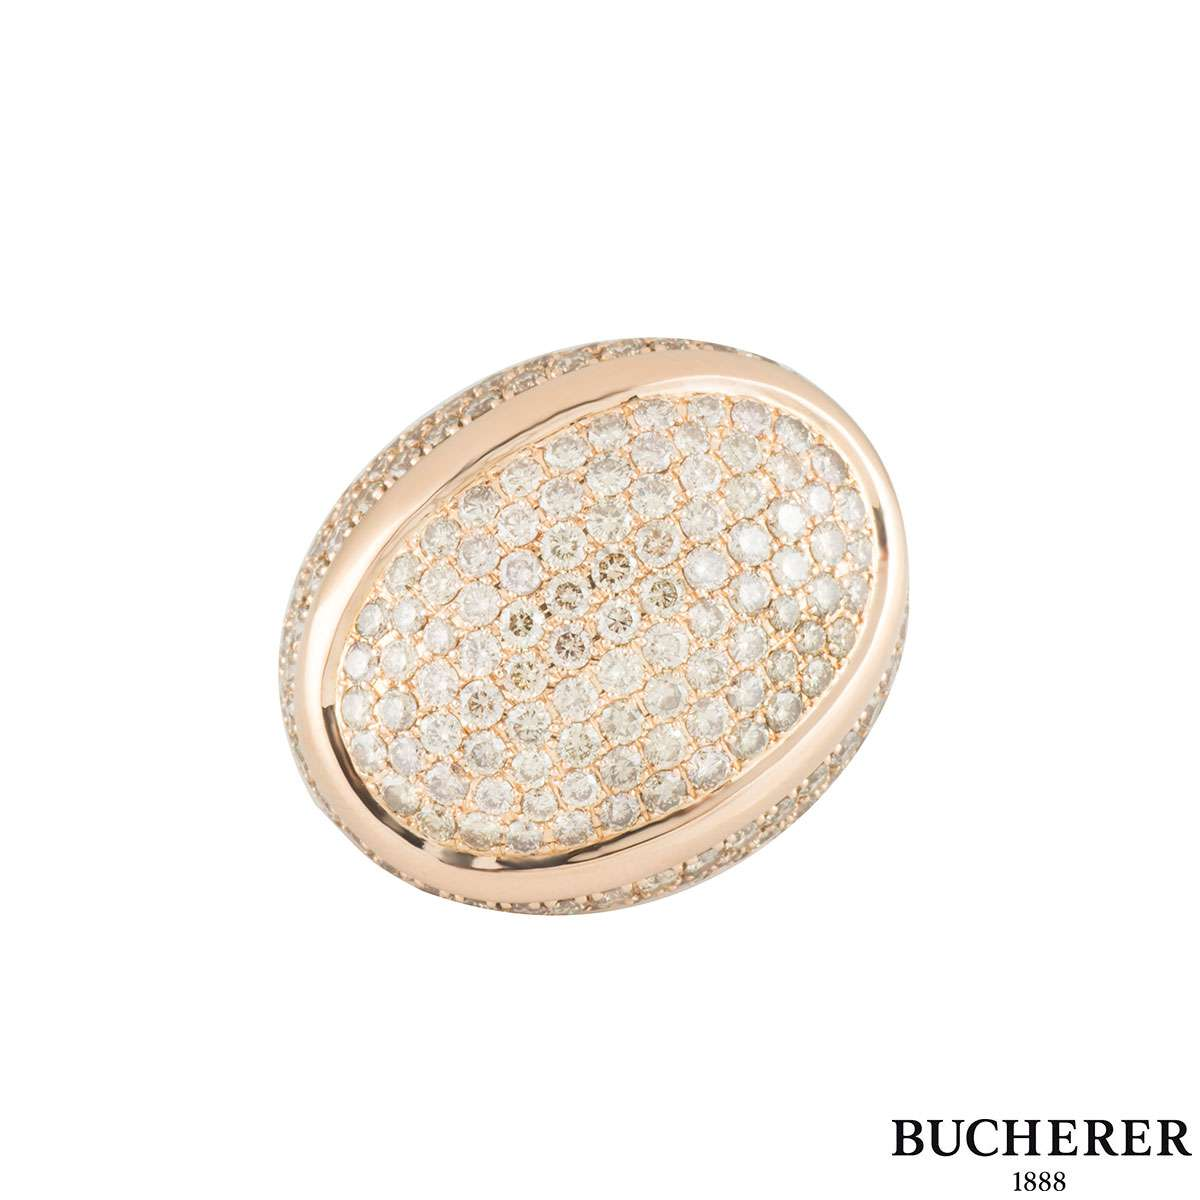 Bucherer Diamond Ring